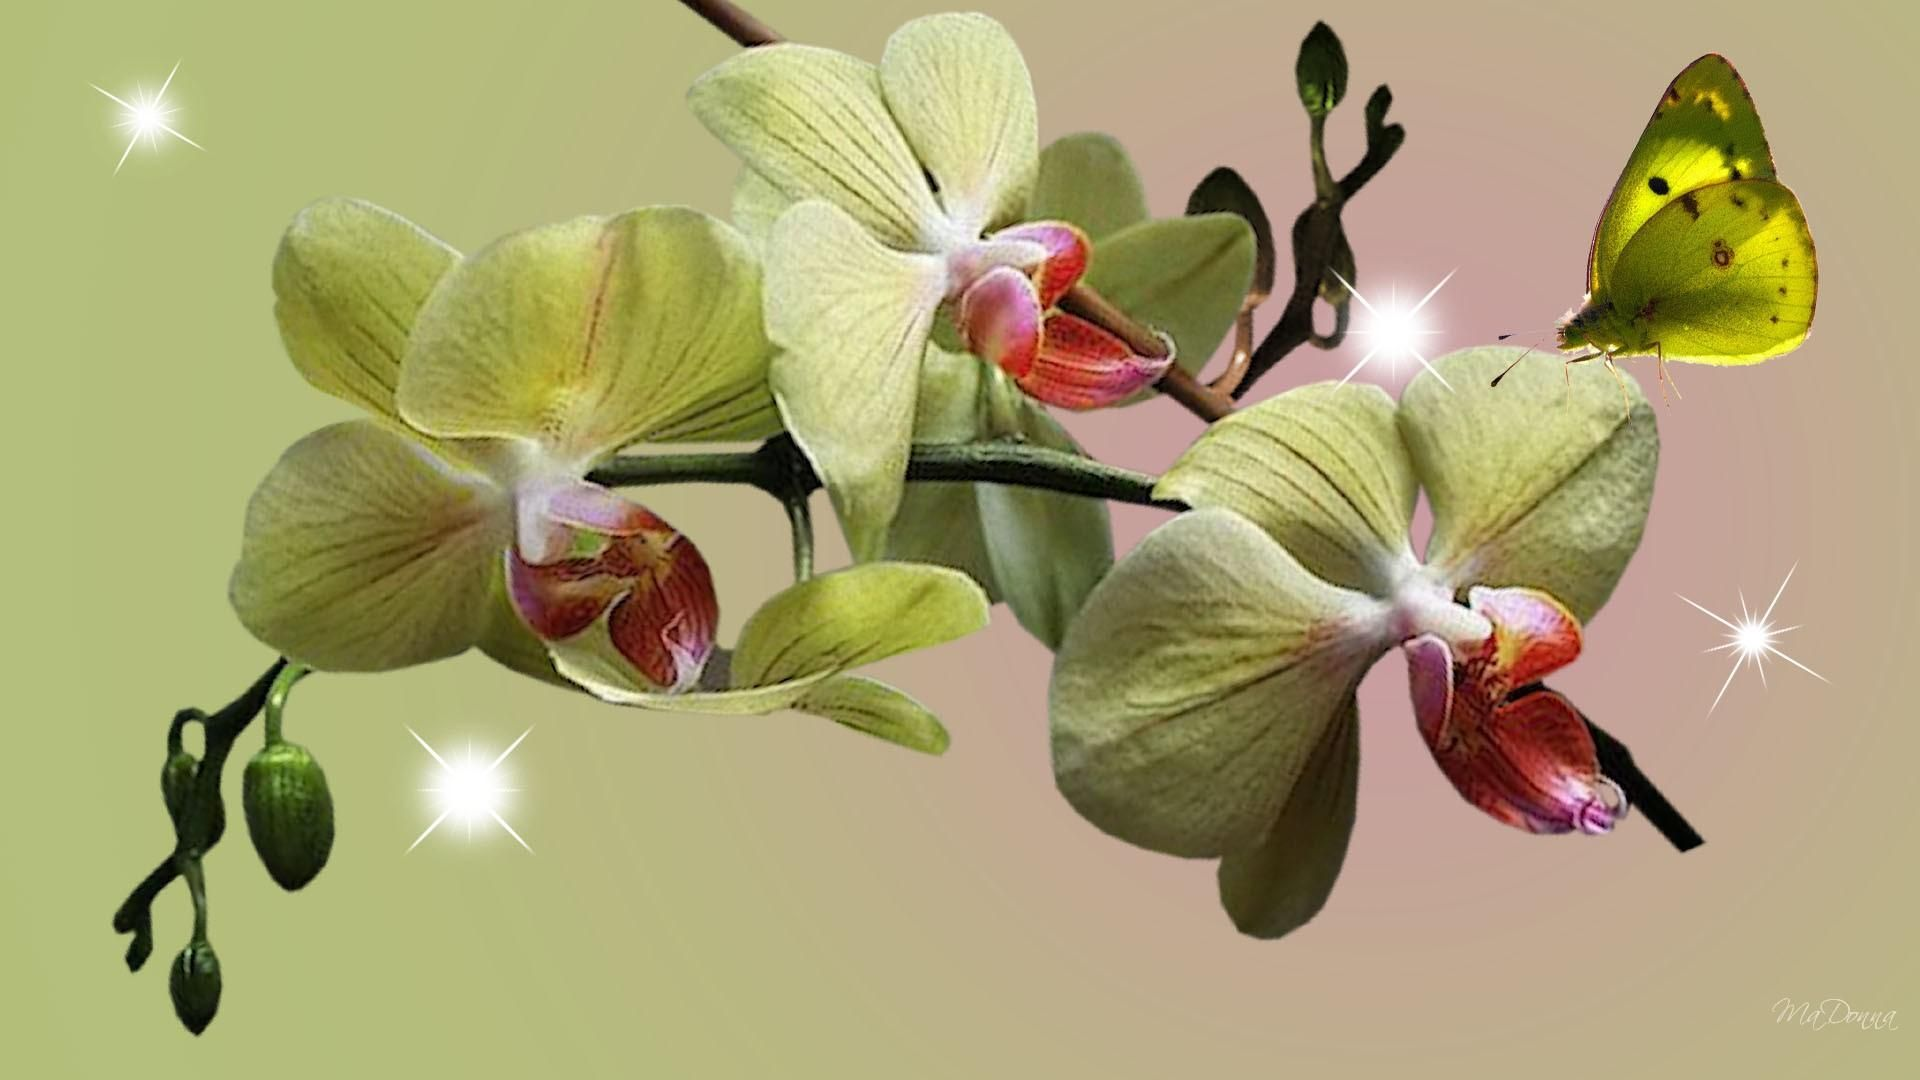 Hd Orchids Green Wallpaper Orchids Beautiful Orchids Green Wallpaper